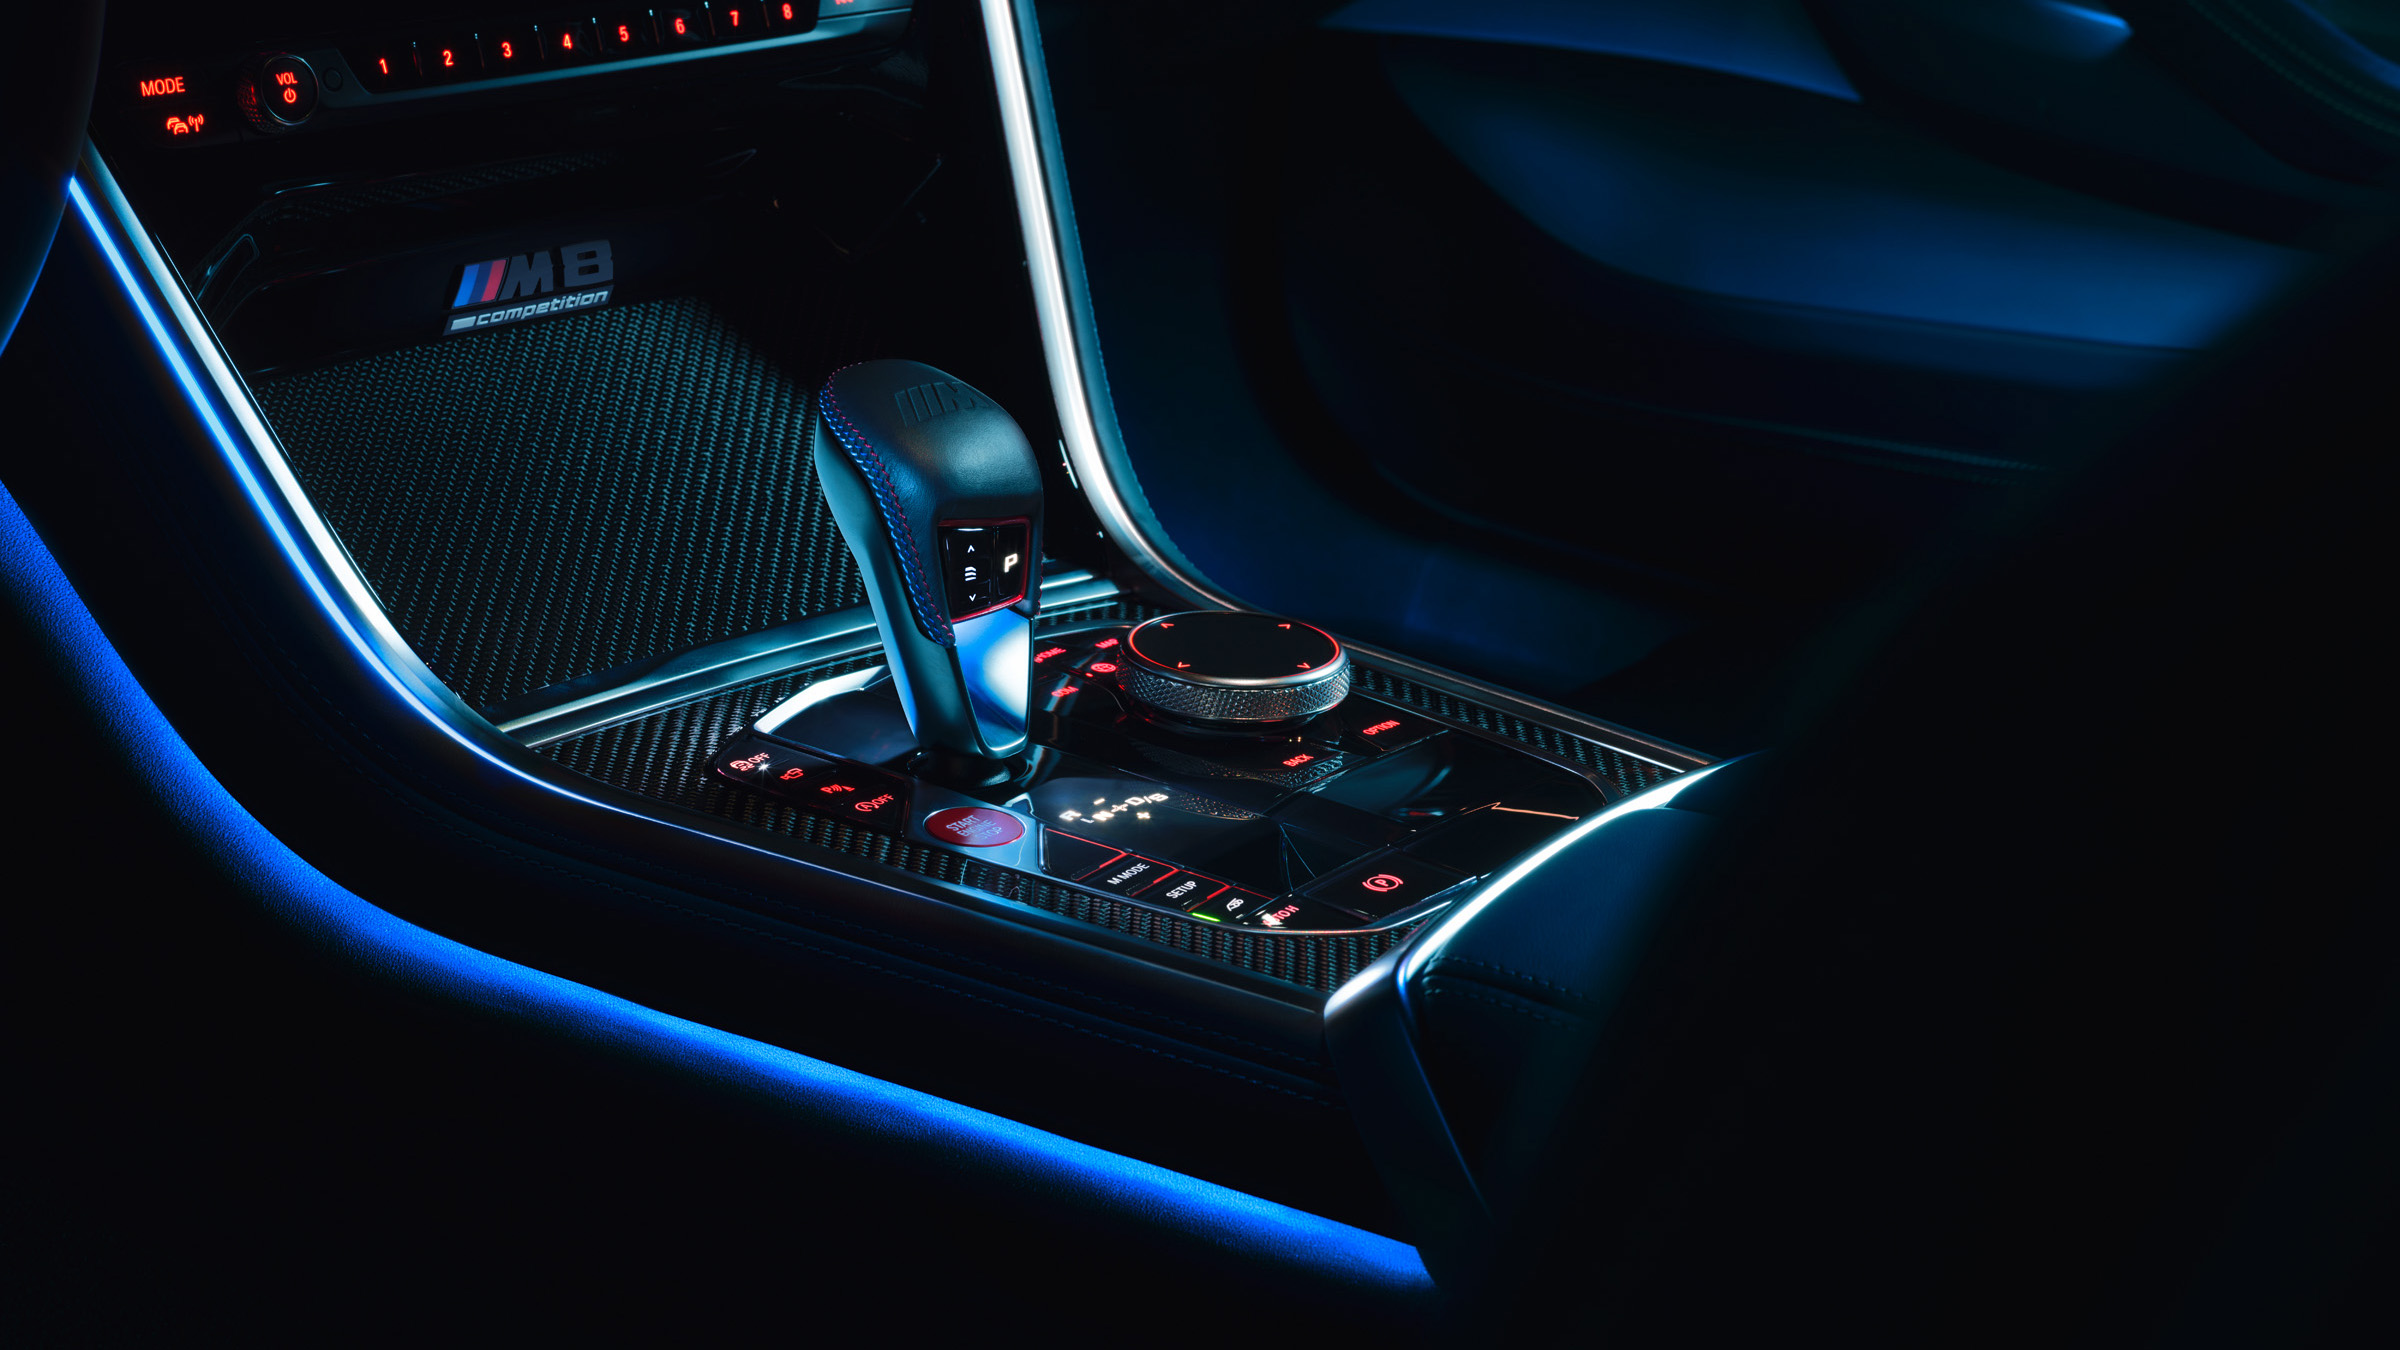 BMW_M8_COUPE_KONRAD_SCHMIDT_05_2400x1350